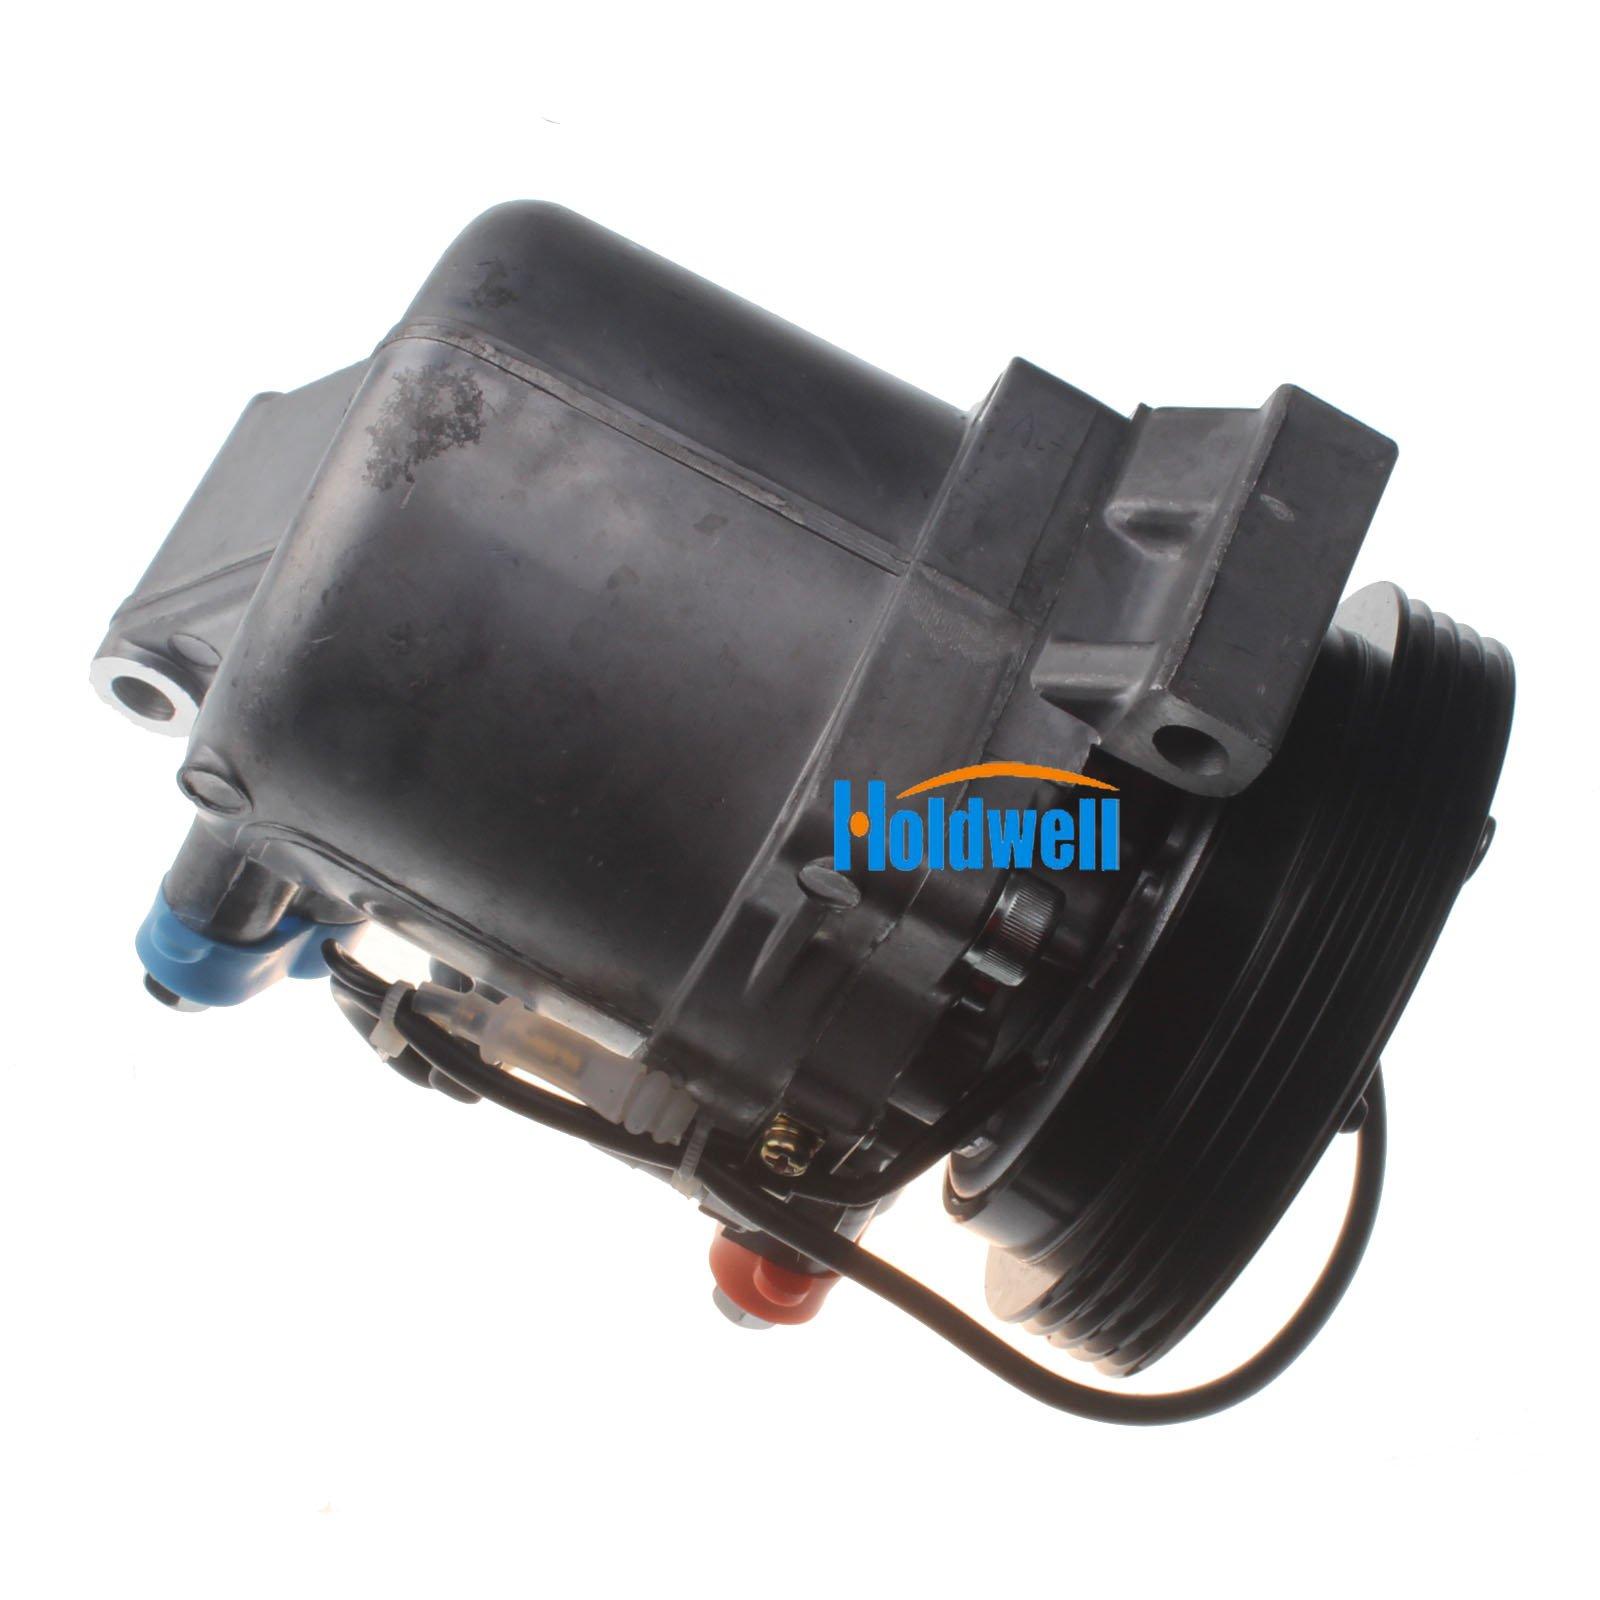 Holdwell Auto AC Compressor 95201-77GB2 9520177GB2 for Suzuki Jimny Seiko Seiki SS07LK10 by Holdwell (Image #5)